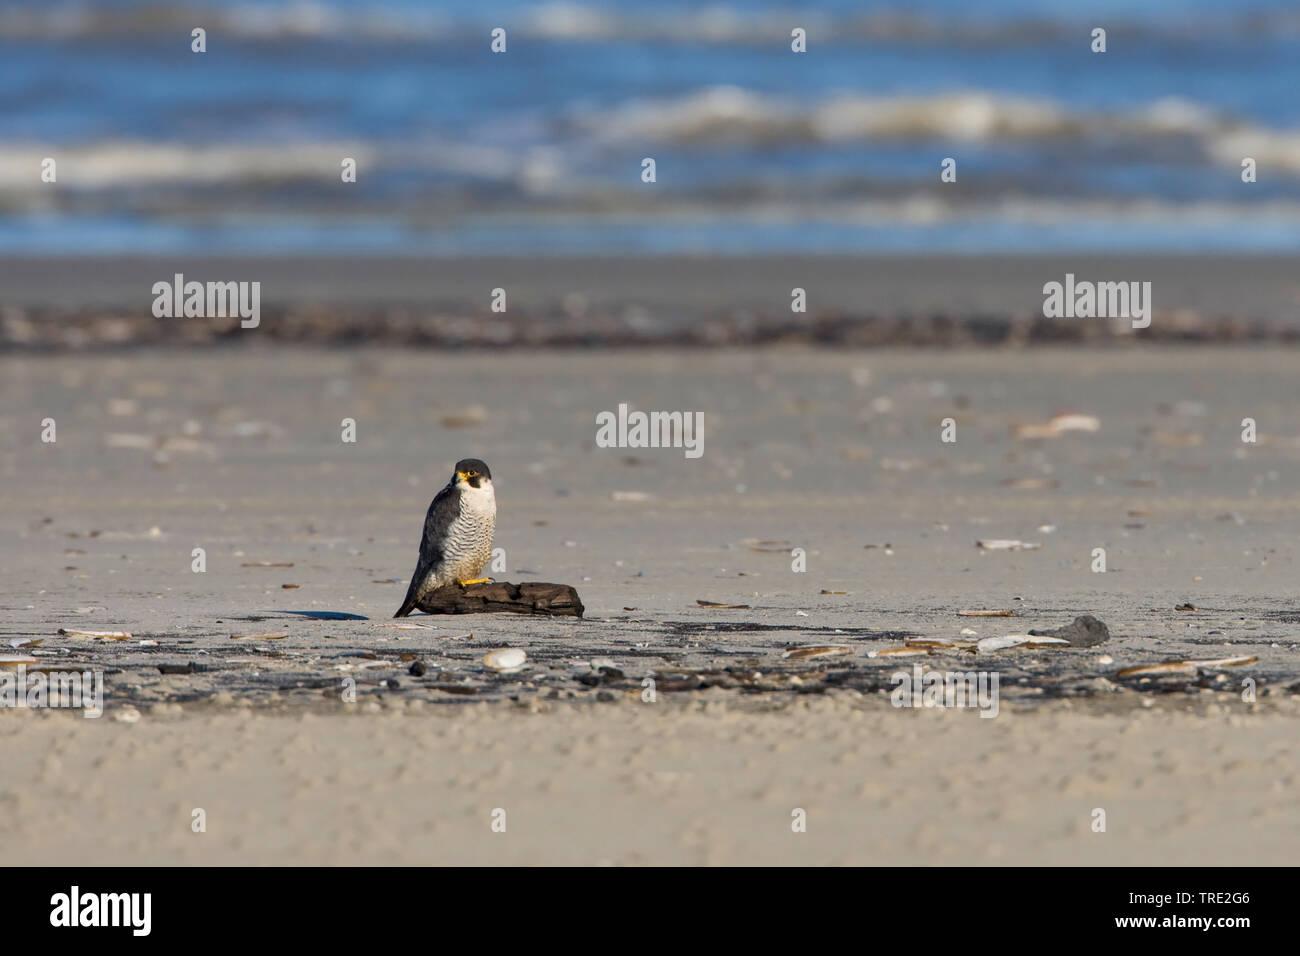 Wanderfalke, Wander-Falke (Falco peregrinus), Maennchen sitzt am Strand, Niederlande, Terschelling   peregrine falcon (Falco peregrinus), male sitting - Stock Image